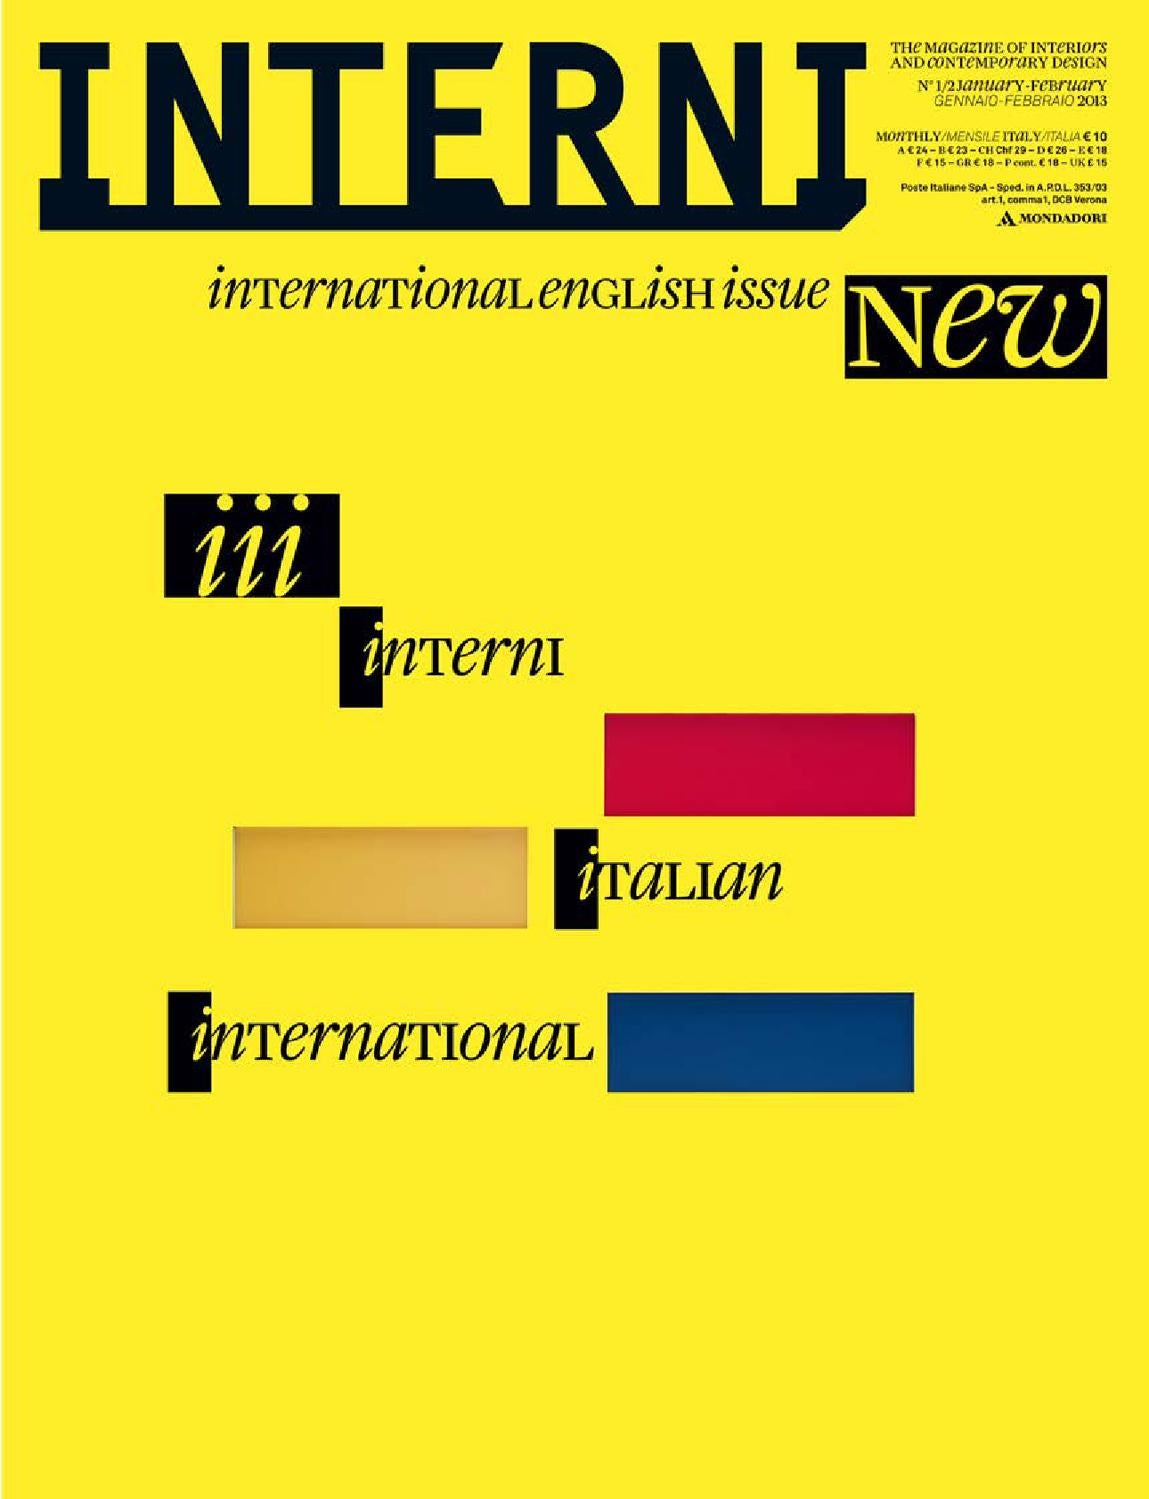 Anna Stilo Arredamenti interni magazine 628 by interni magazine - issuu